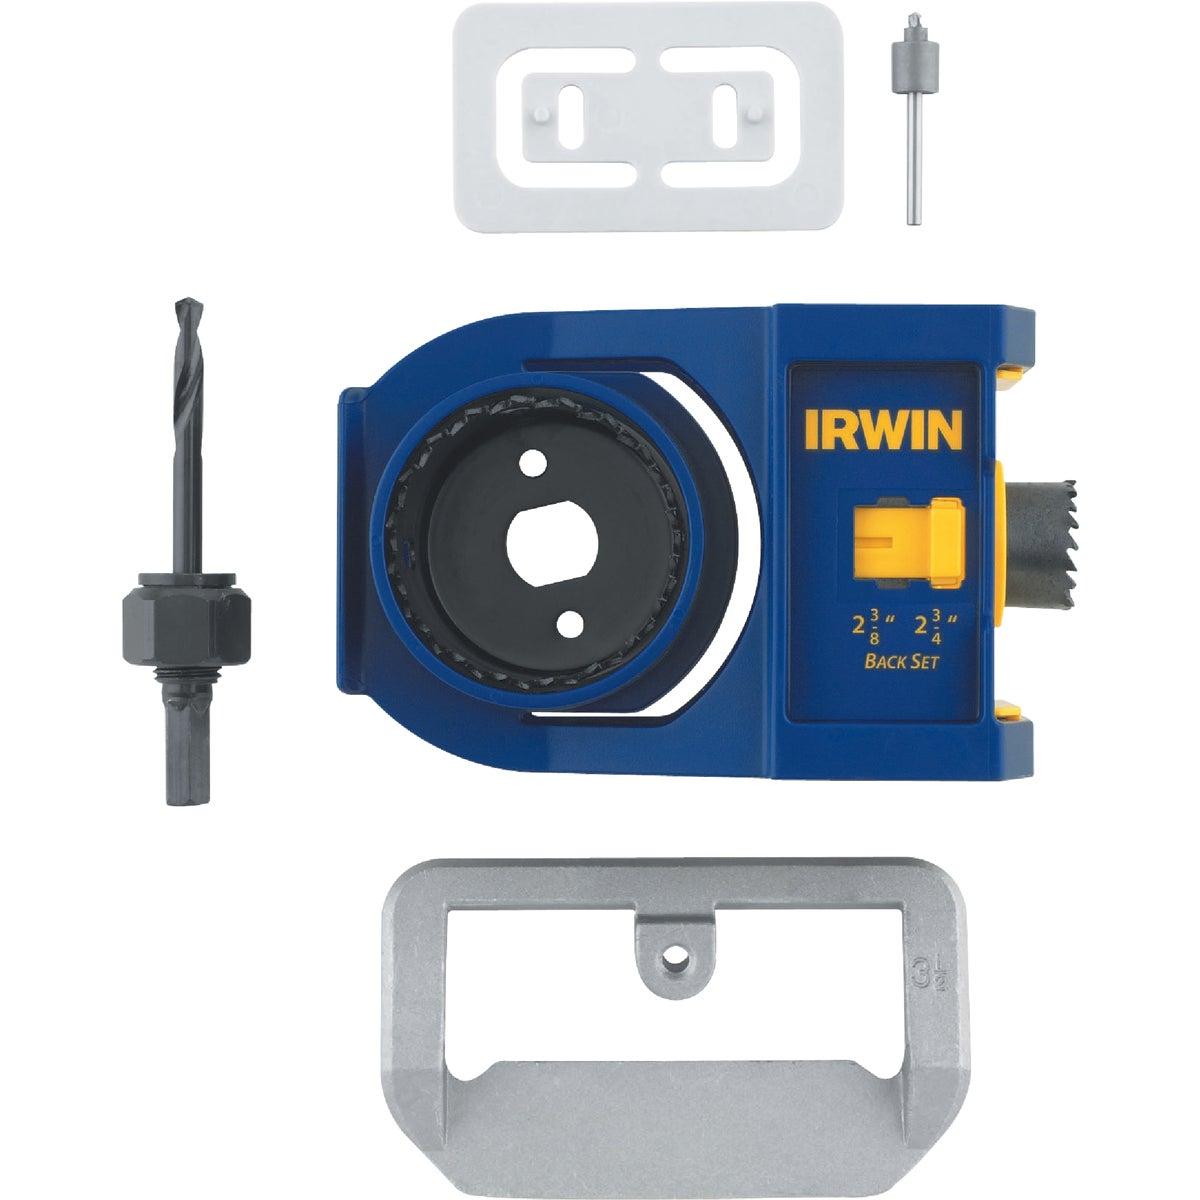 Lock Installation Kits